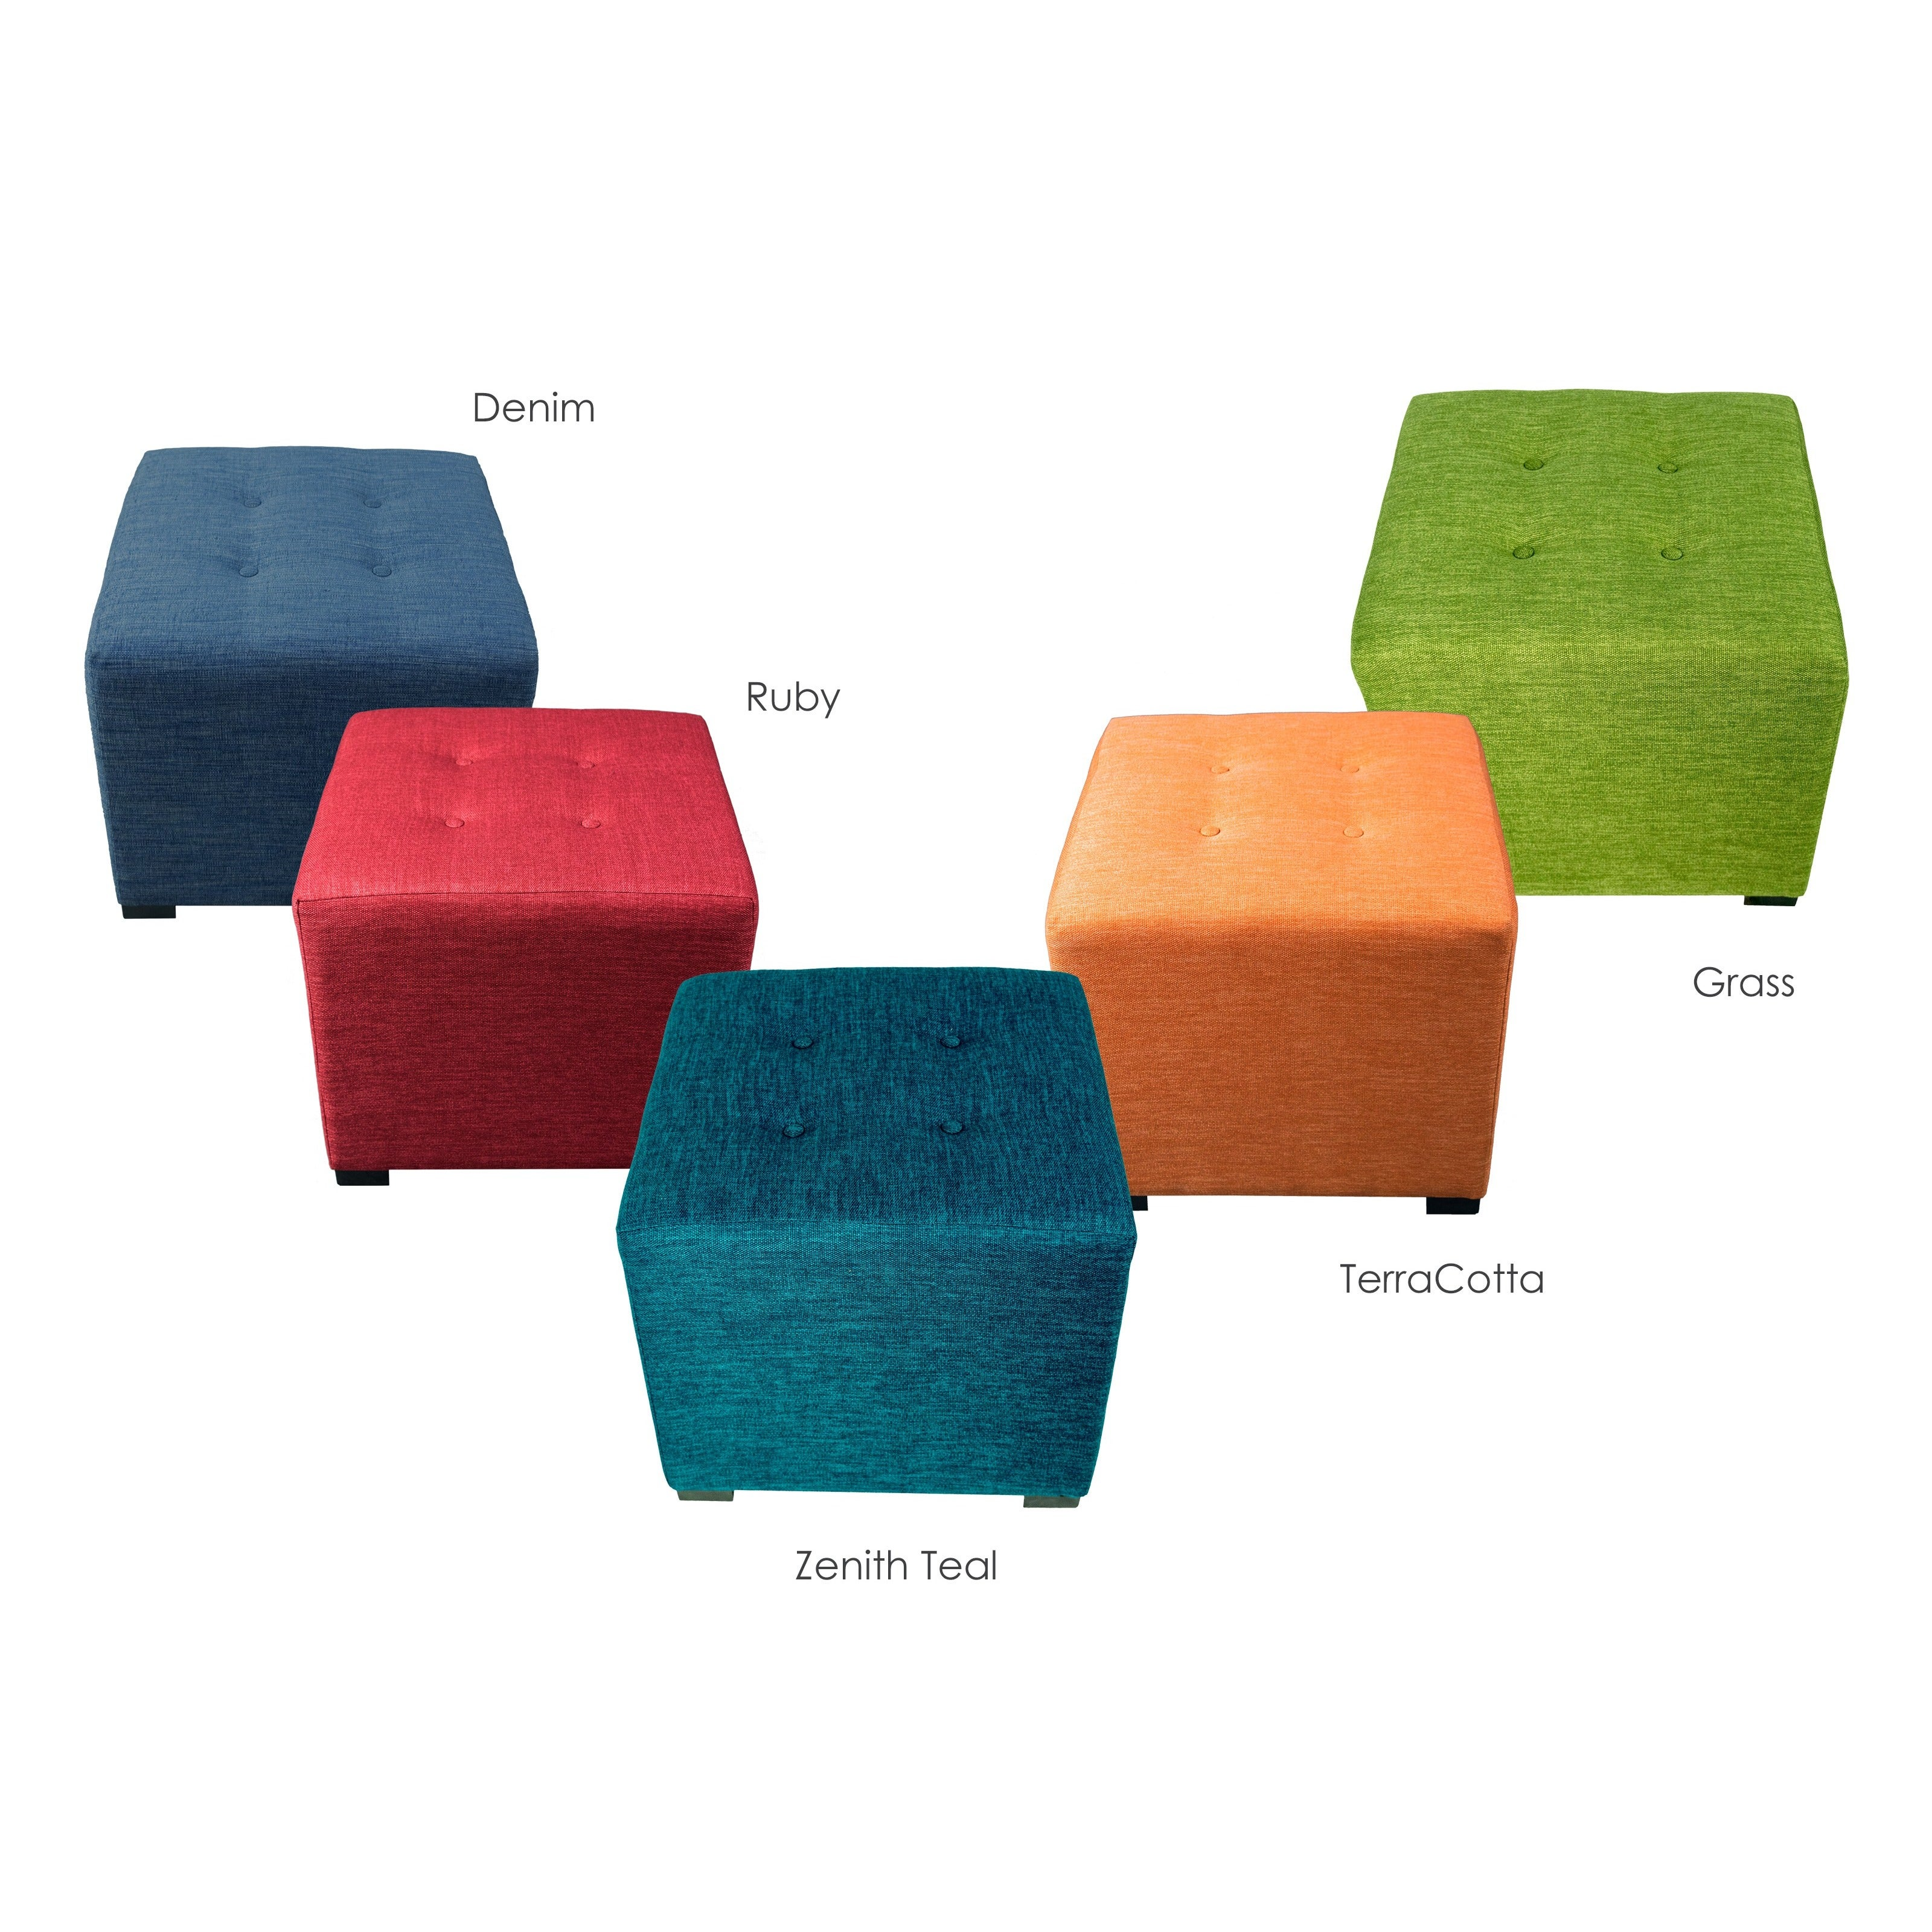 MJL Furniture Key Largo 4-button Tufted Square Ottoman